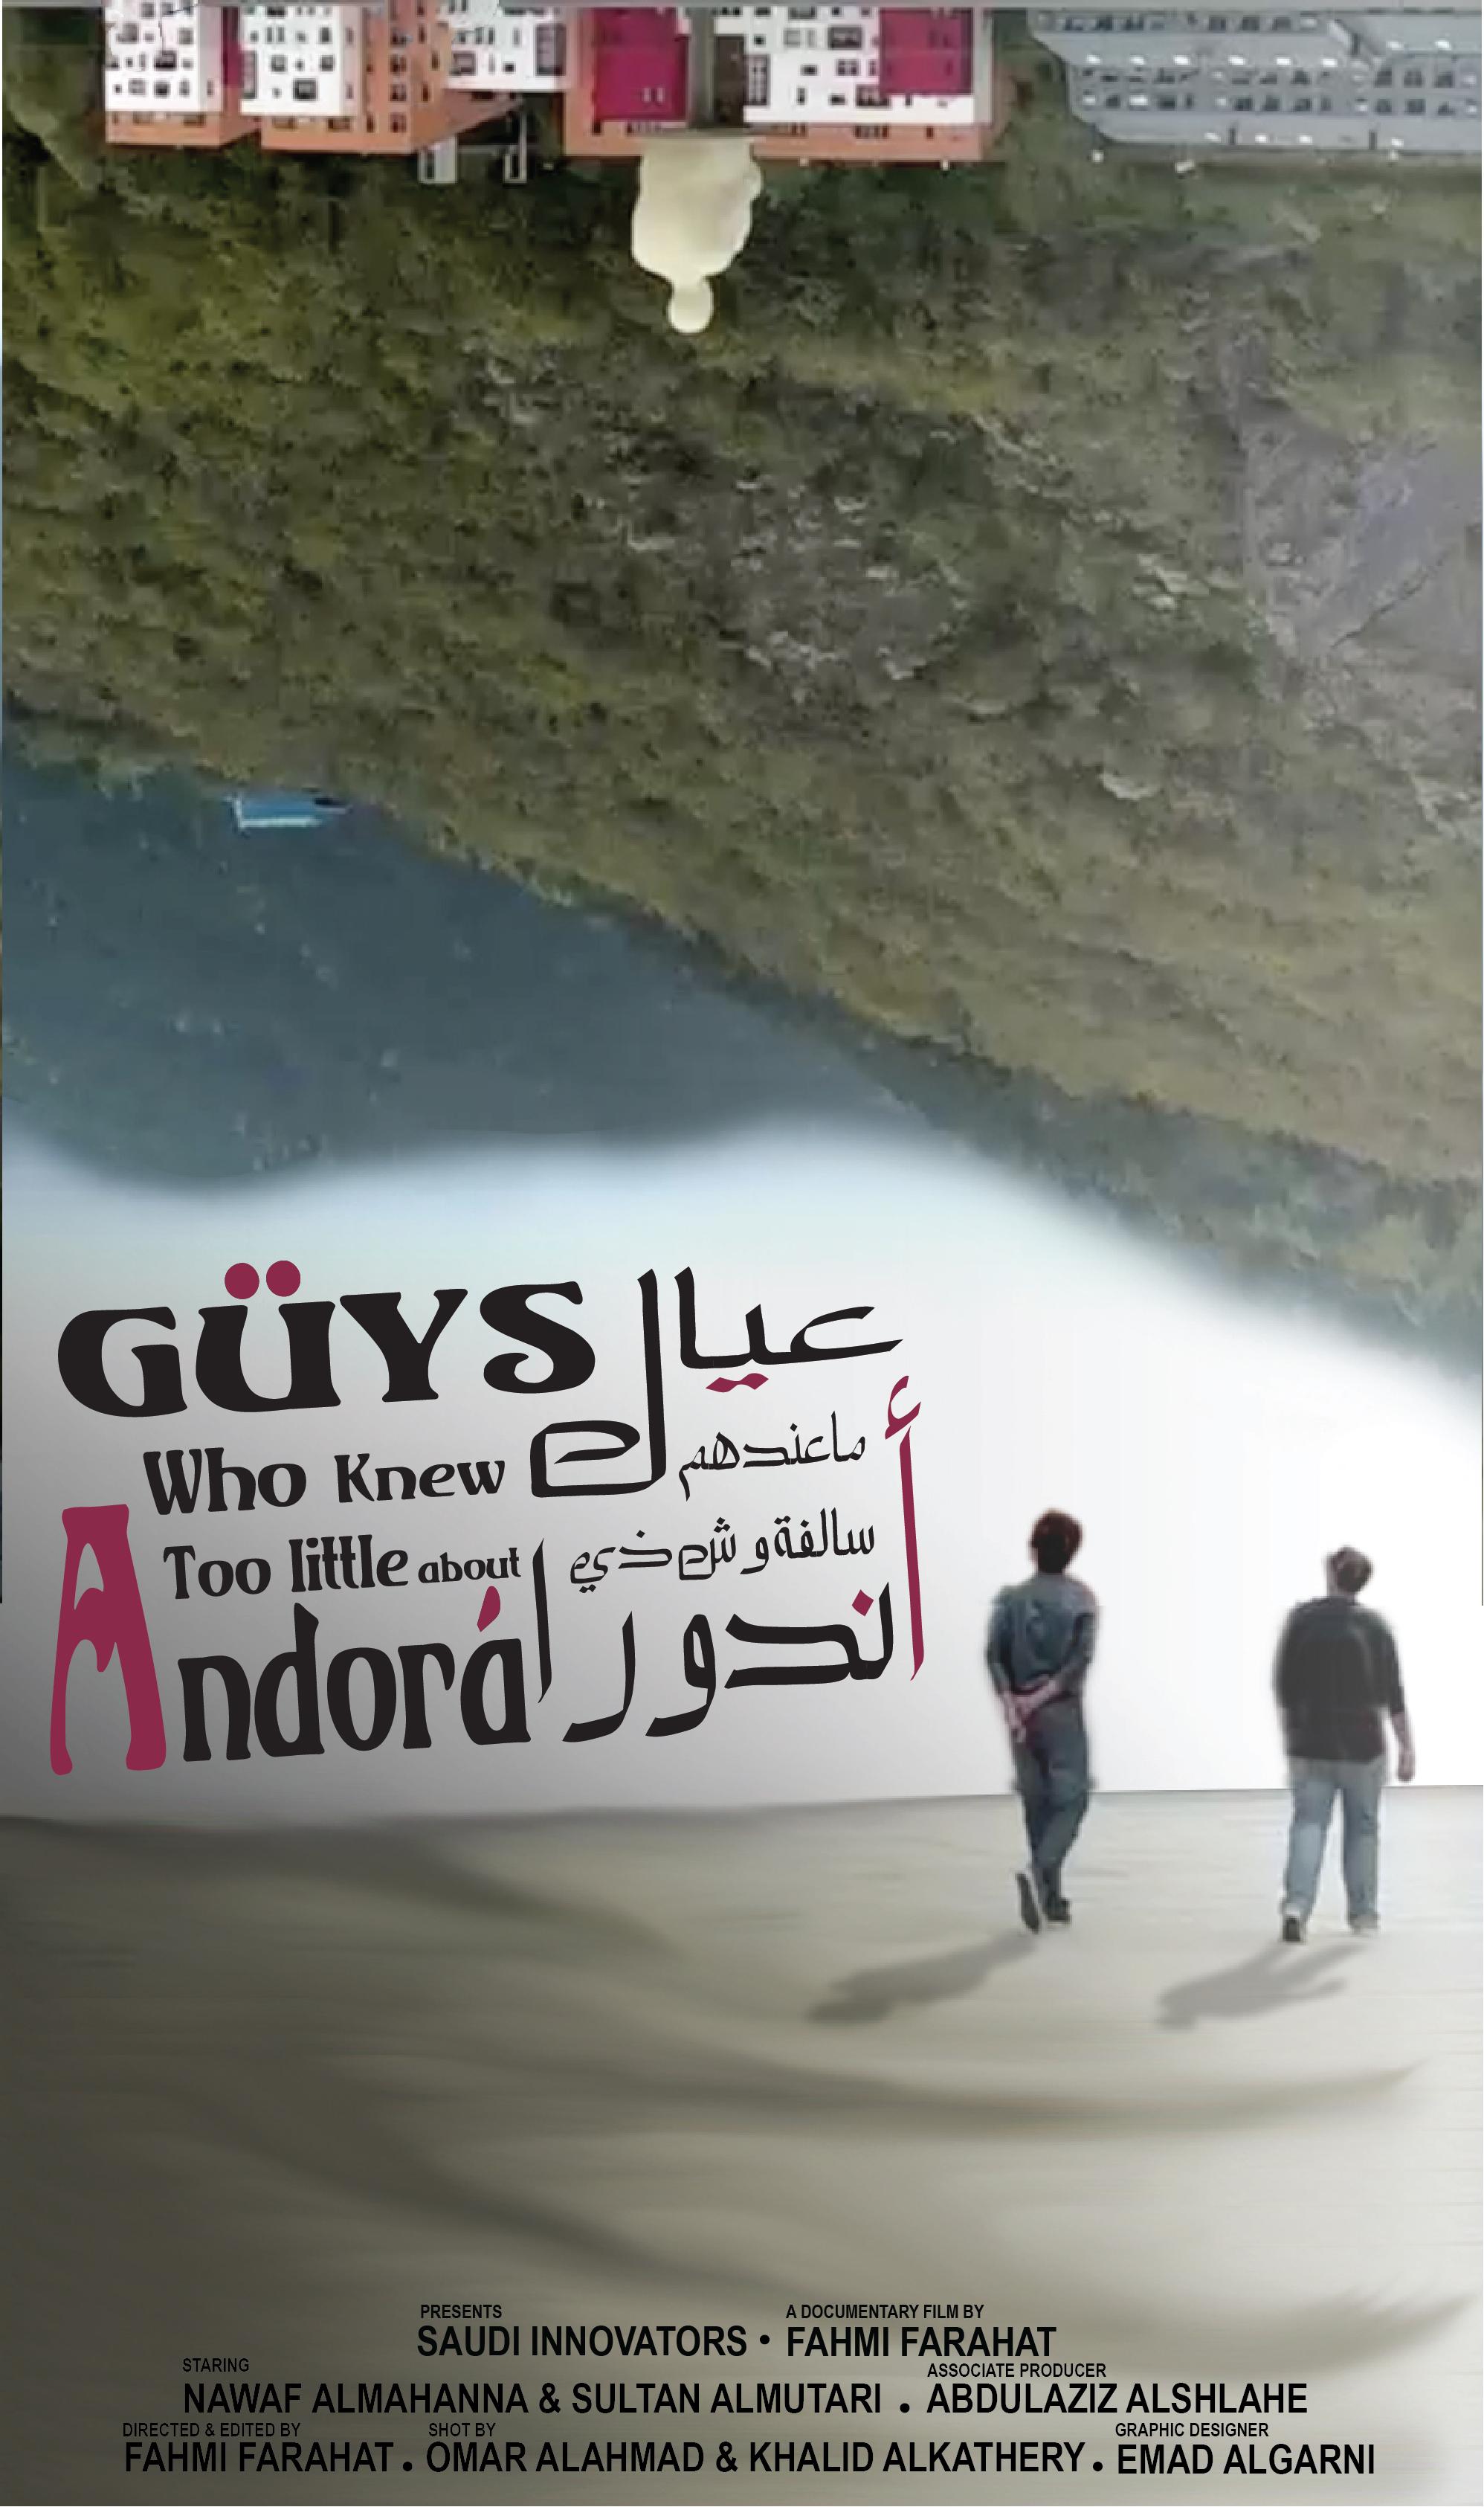 Andorra Guys